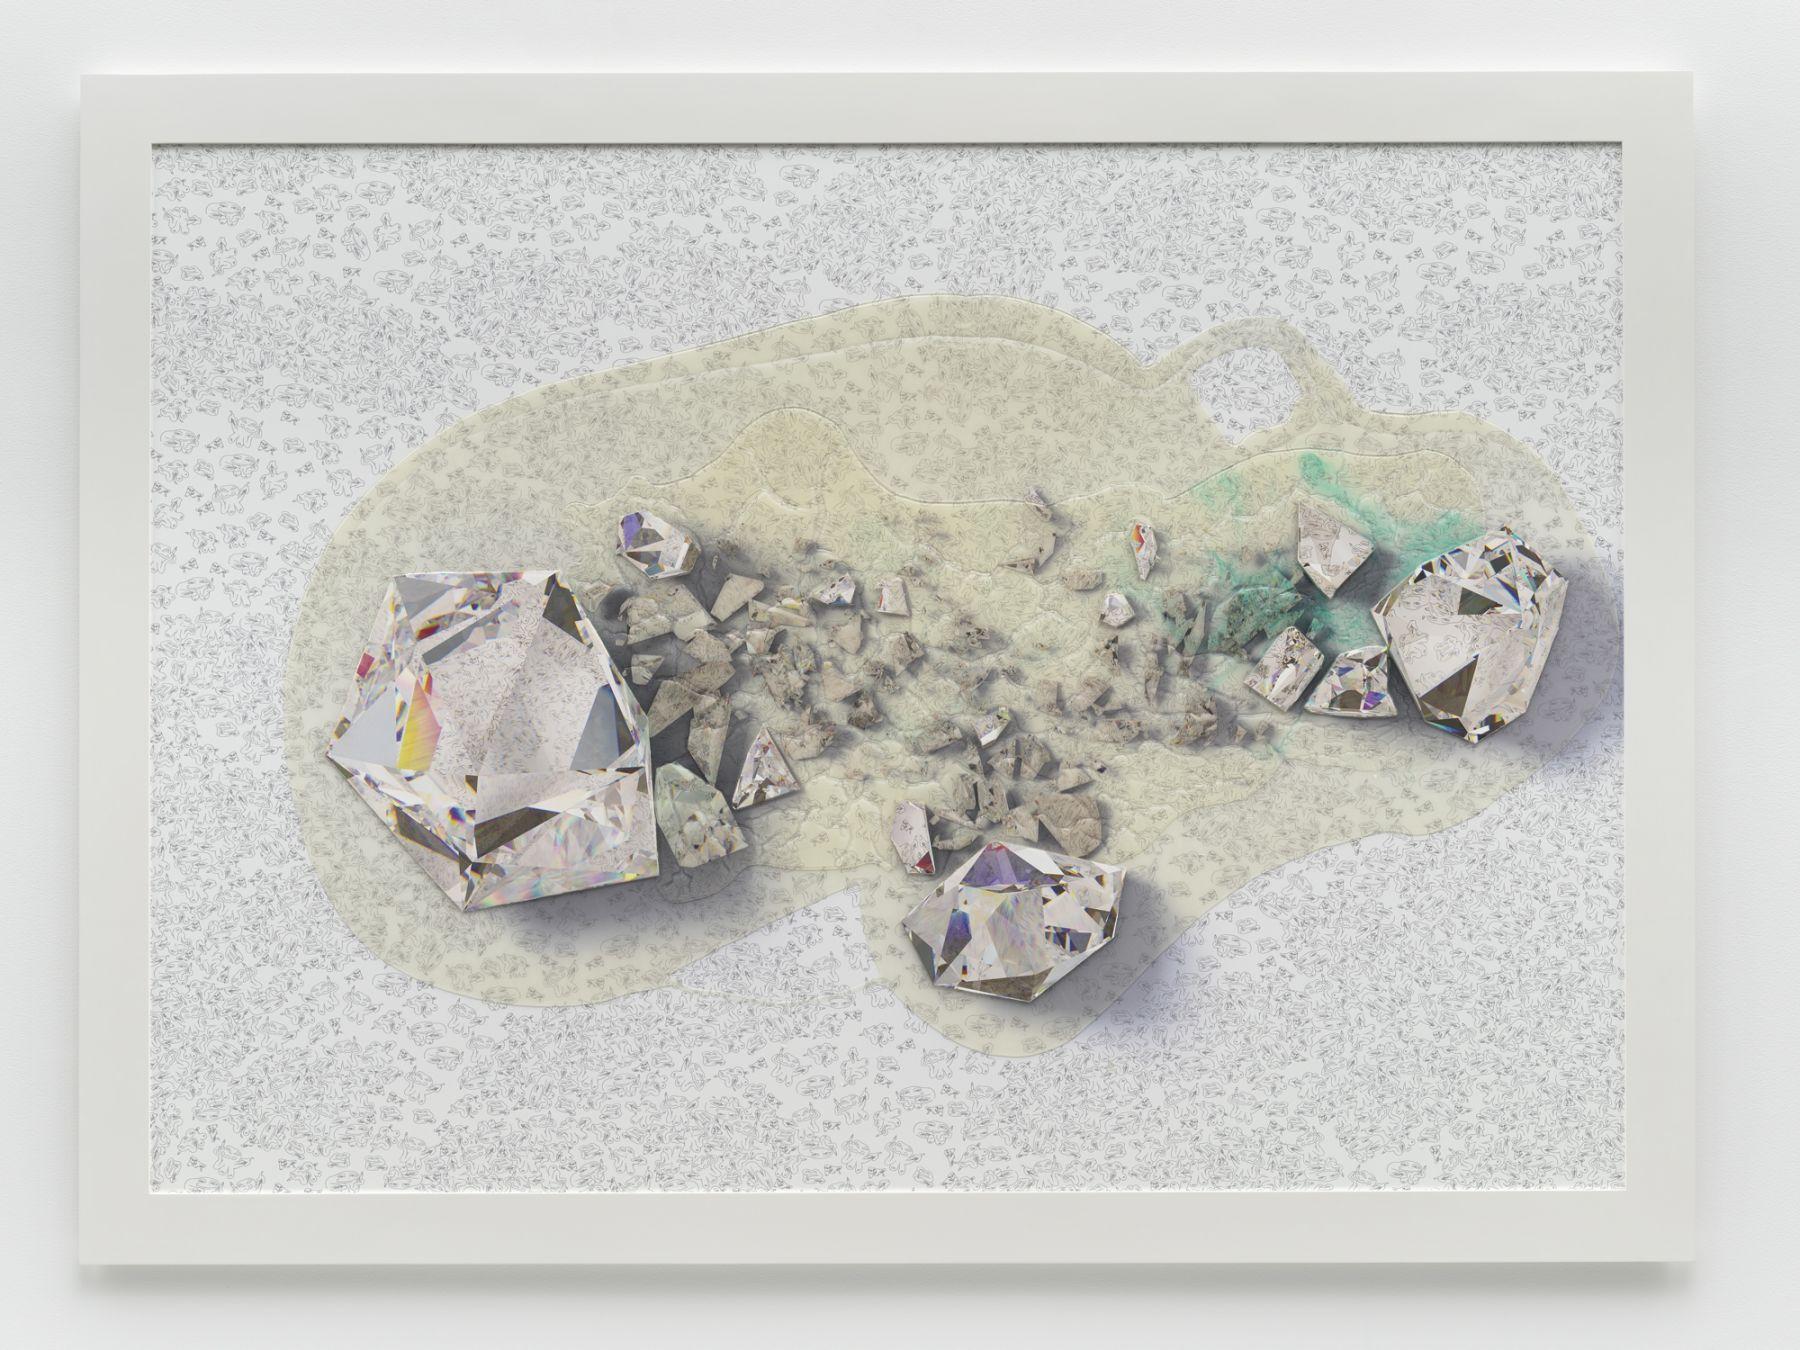 Seth Price, Crystalline Spill Lattice